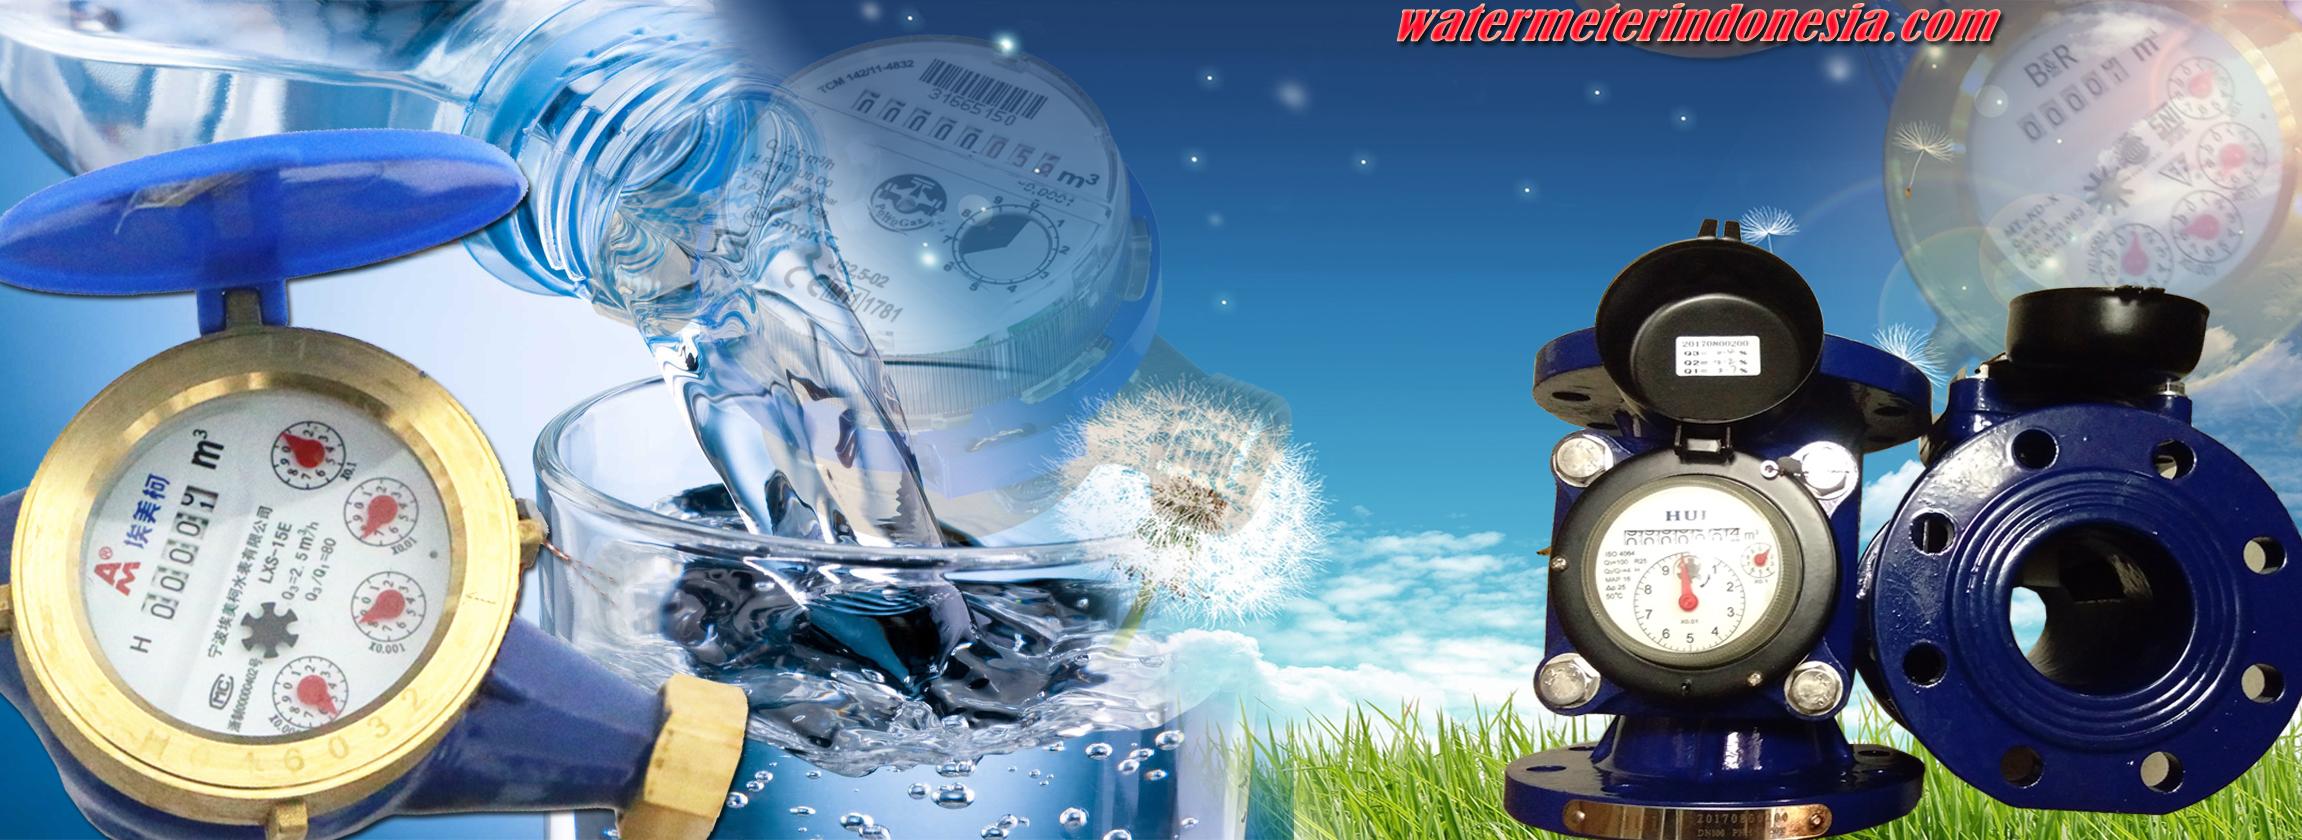 DISTRIBUTOR WATER METER